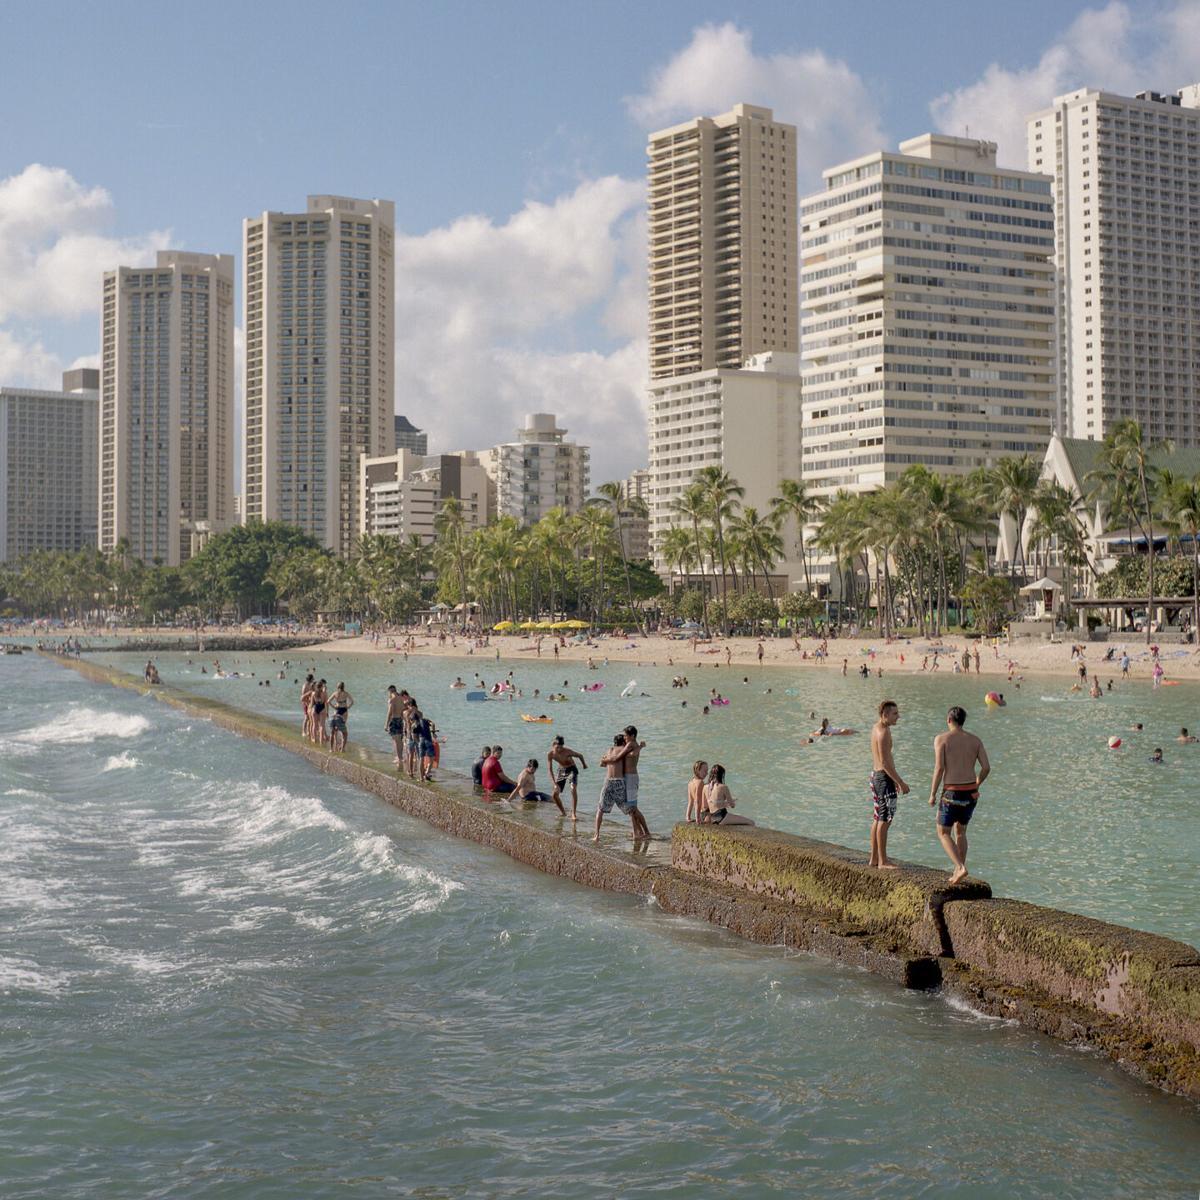 Outtake of Waikiki